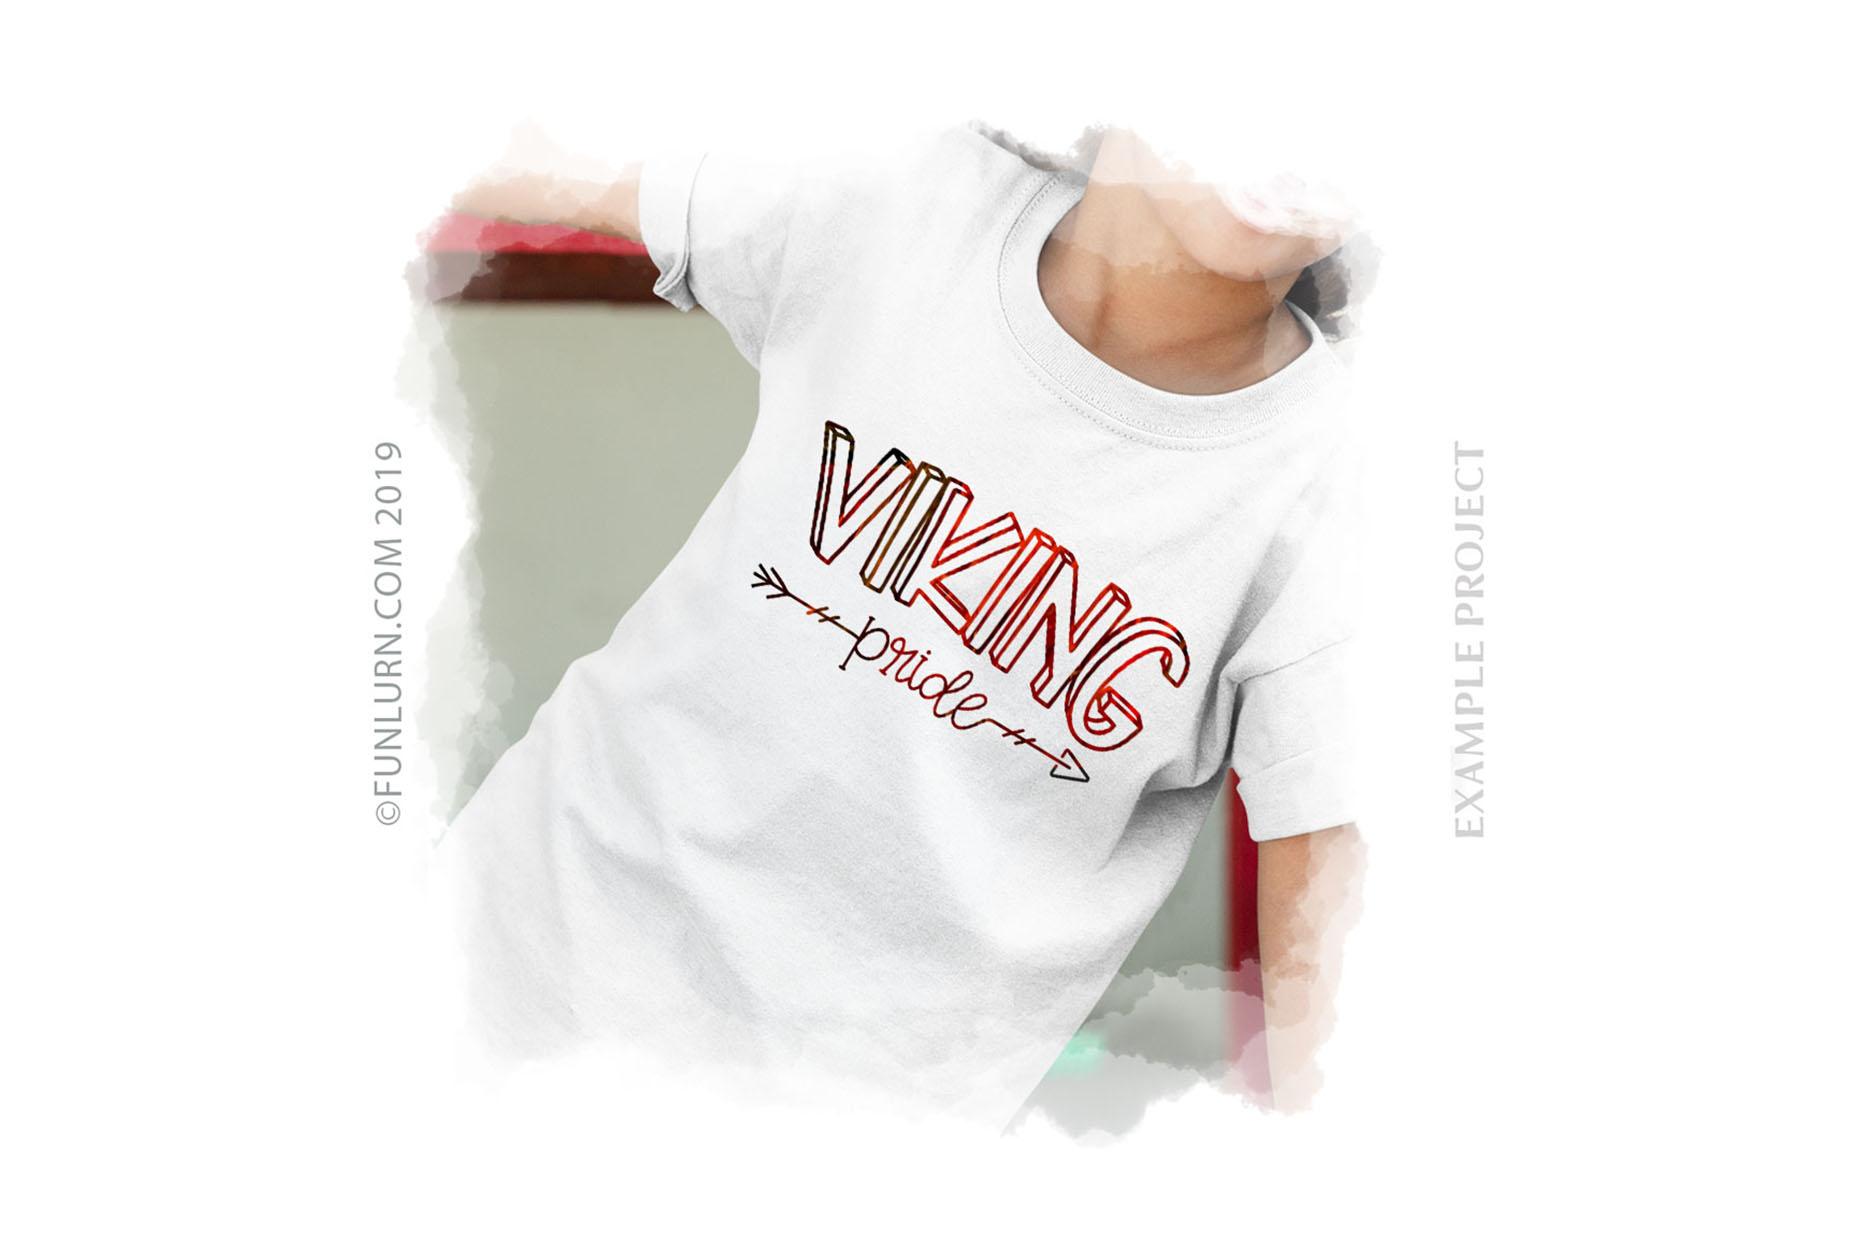 Viking Pride Team SVG Cut File example image 3